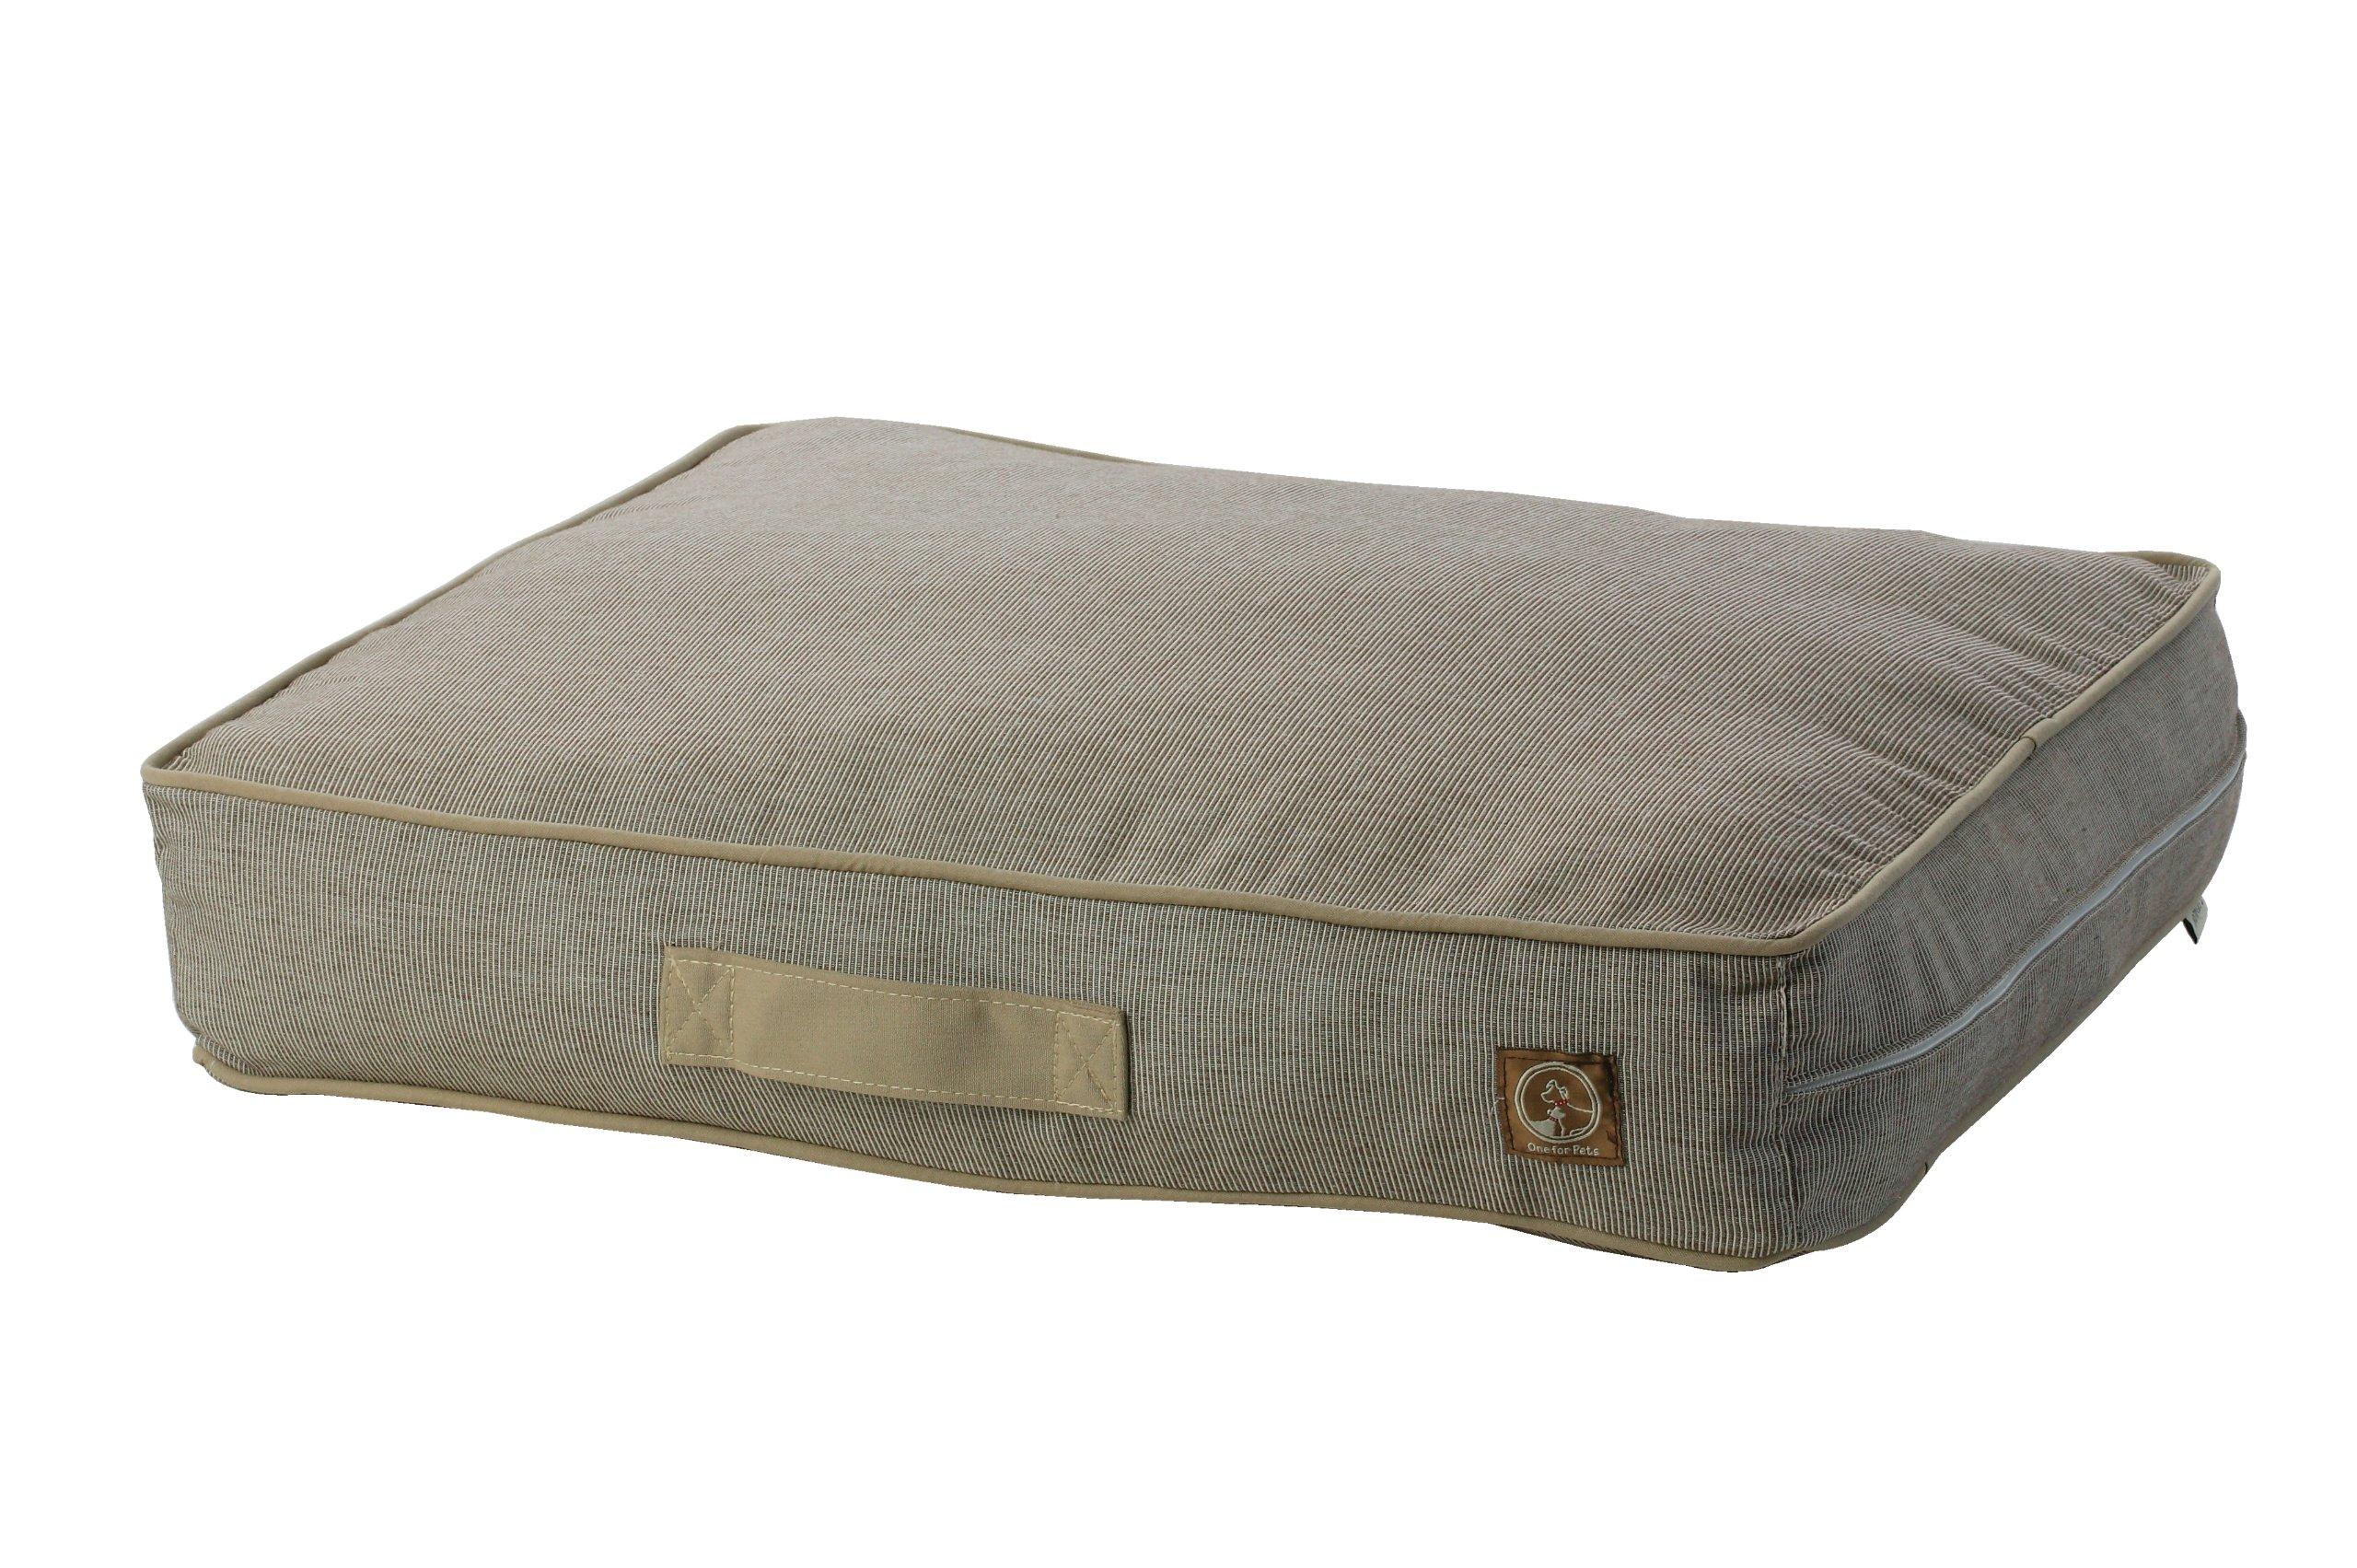 One for Pets Siesta Indoor/Outdoor Pet Bed Dog Bed Duvet Cover, Medium, Brown